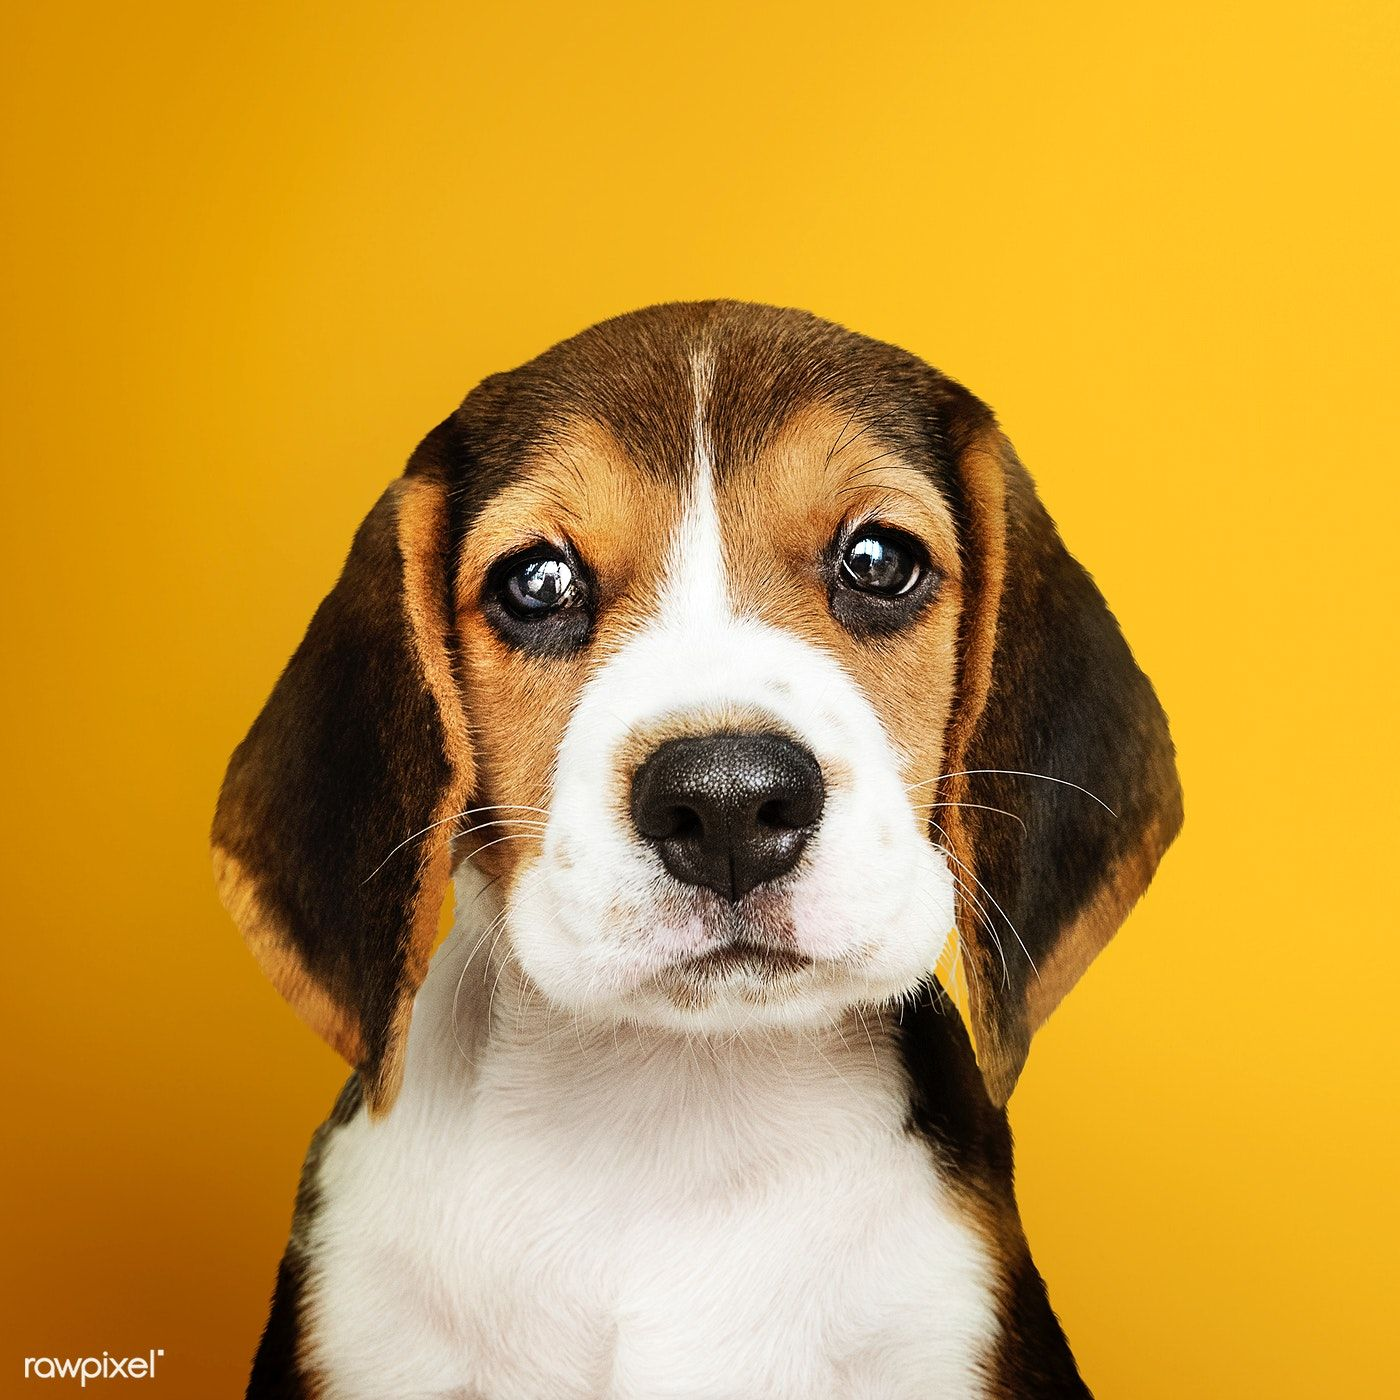 Download Premium Photo Of Adorable Beagle Puppy Solo Portrait